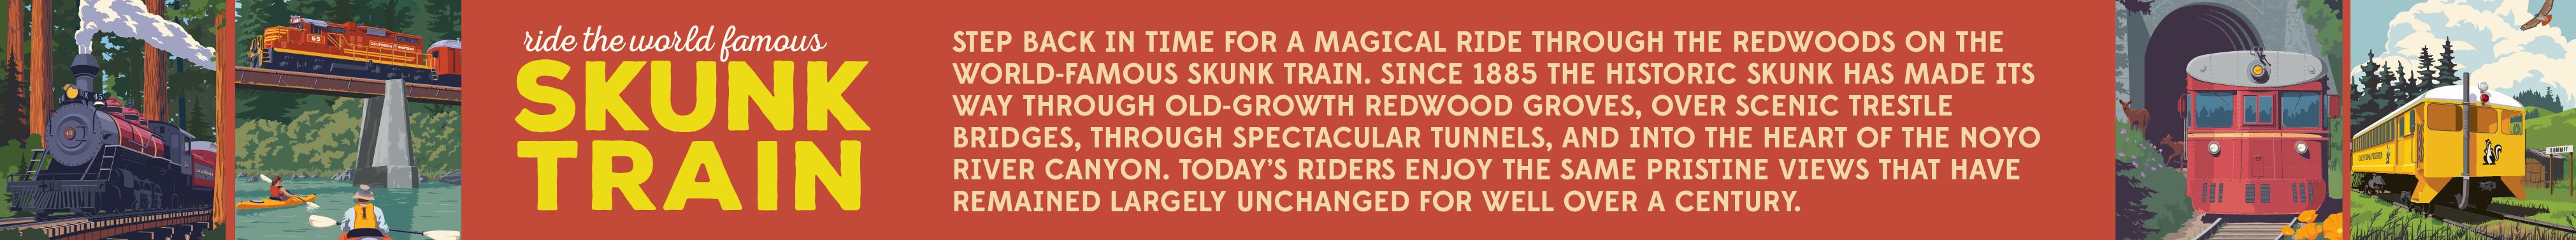 Skunk Train 2021 Banner